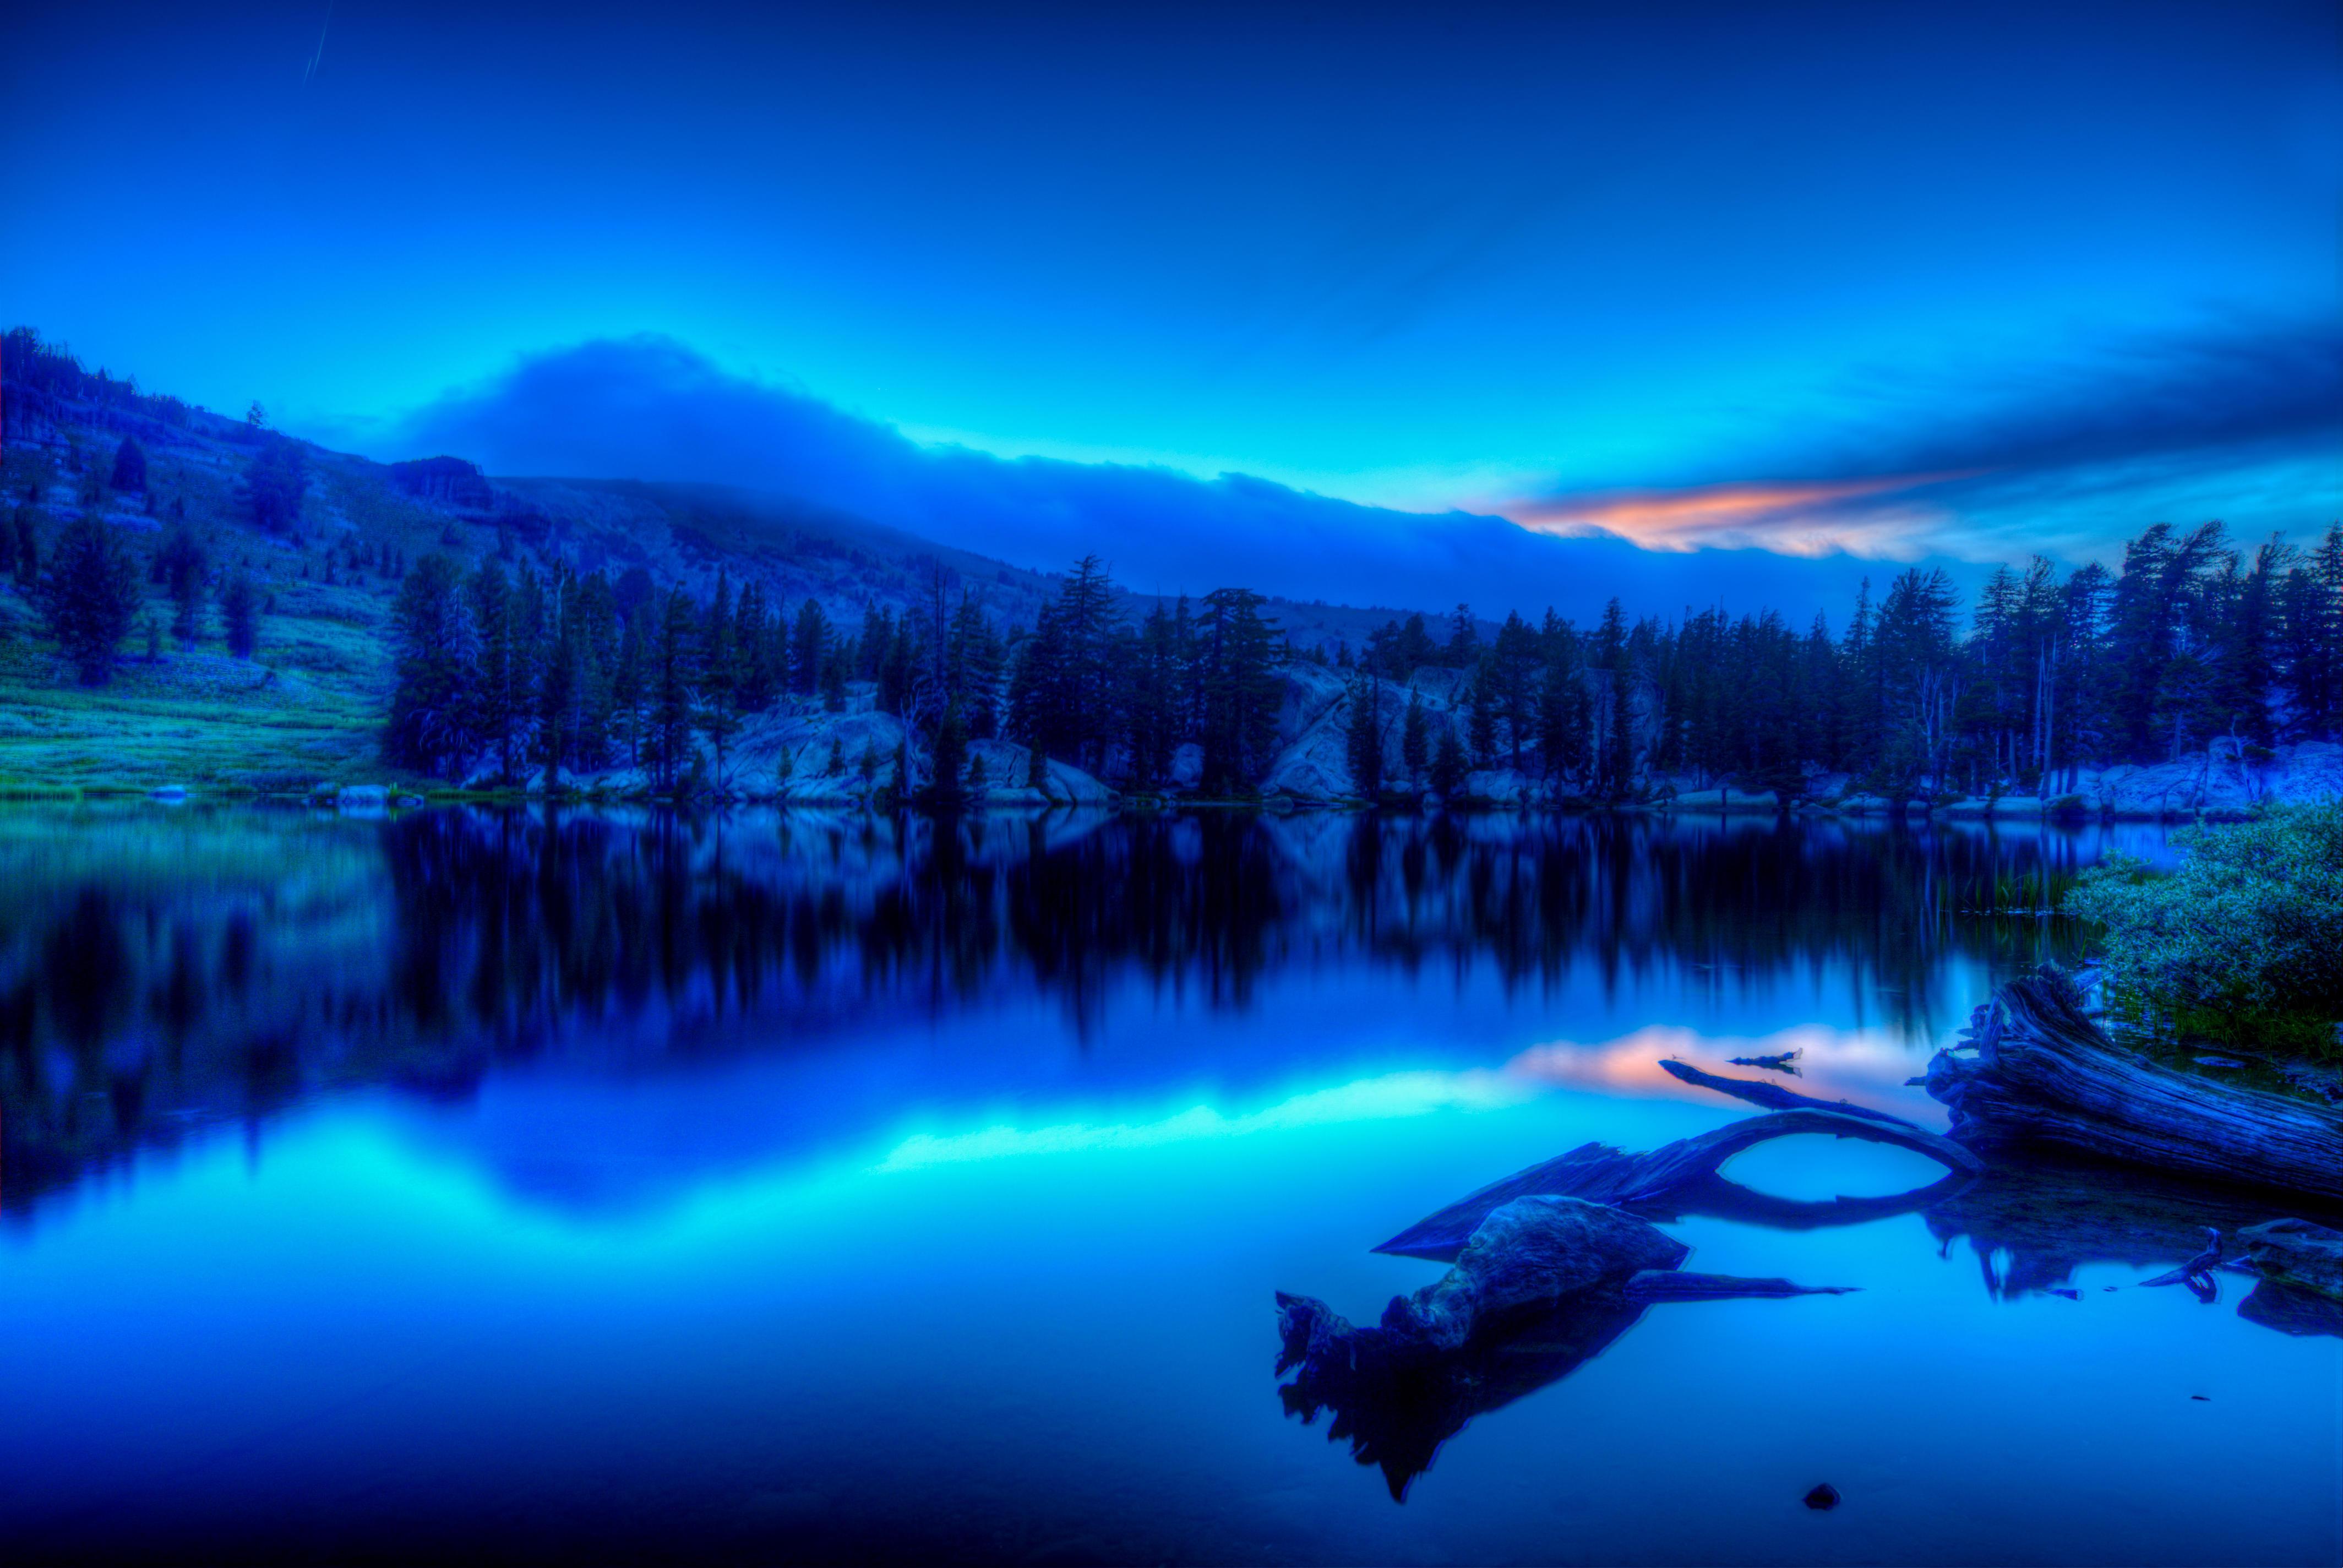 Обои Shower Lake, Сьерра-Невада, Калифорния, Тихоокеанский гребень